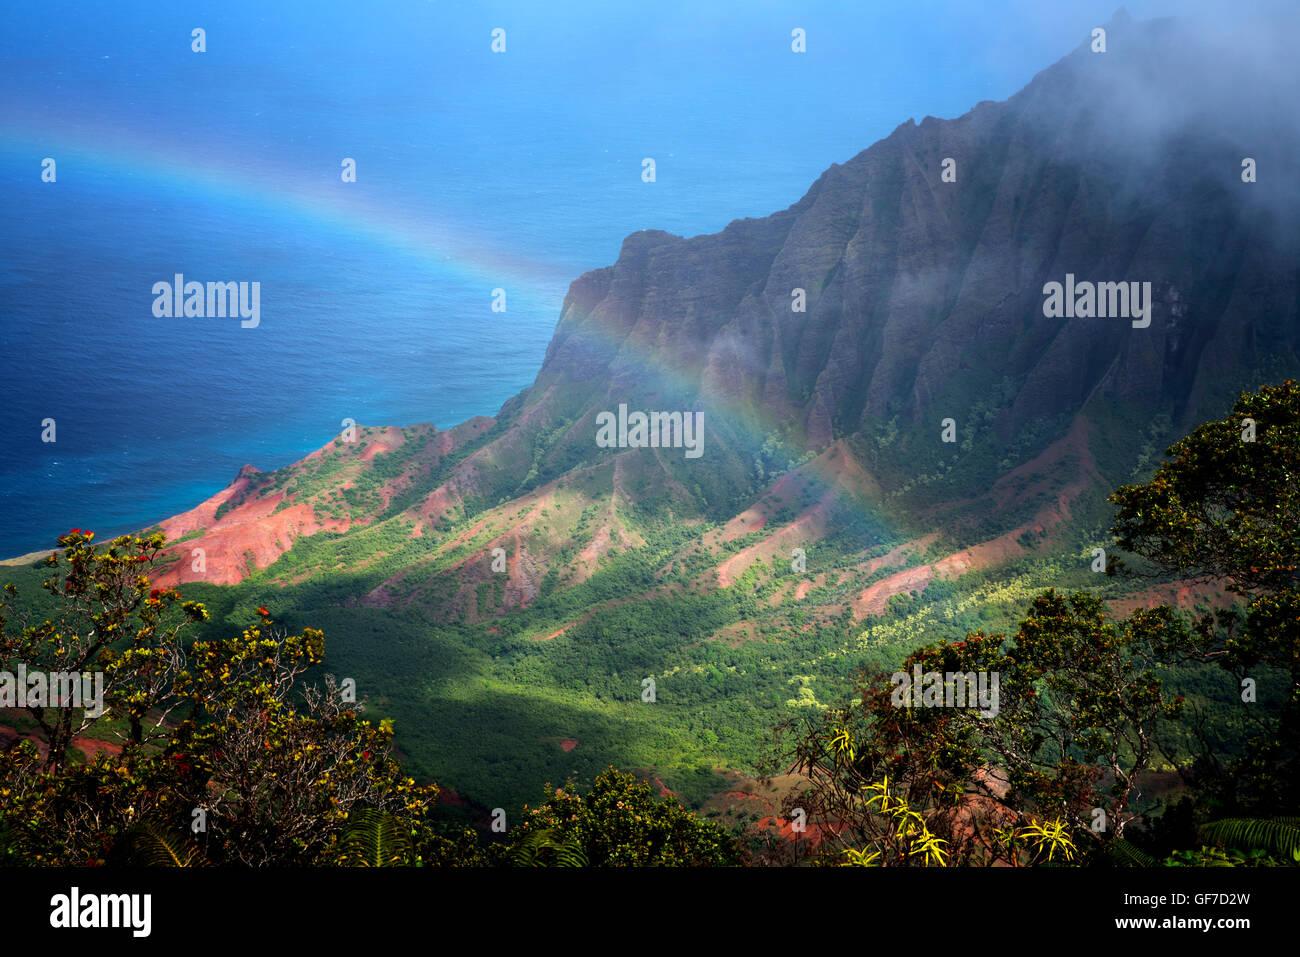 Rainbow as seen from Kalalau Lookout. Waimea Canyon. Kauai, Hawaii - Stock Image